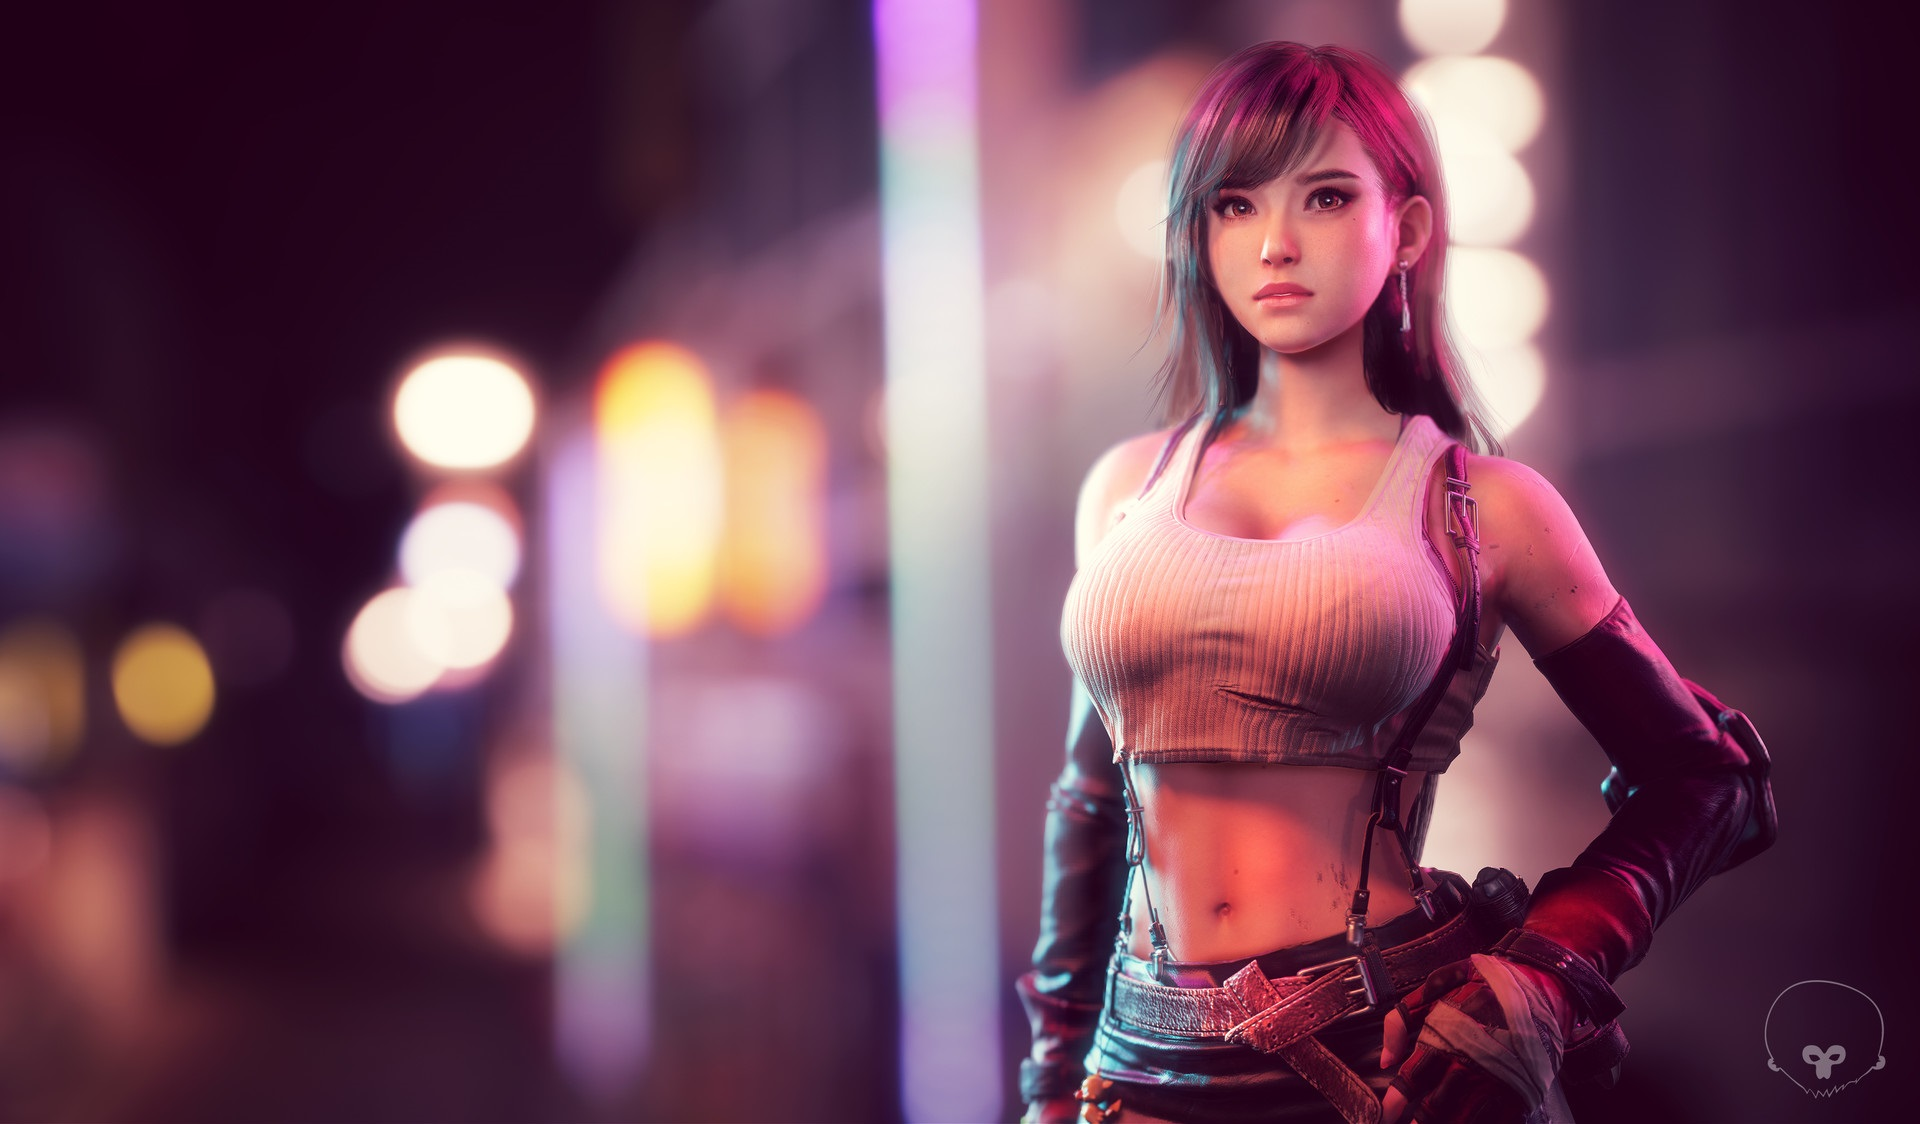 2932x2932 Tifa Lockhart Final Fantasy Artwork Ipad Pro